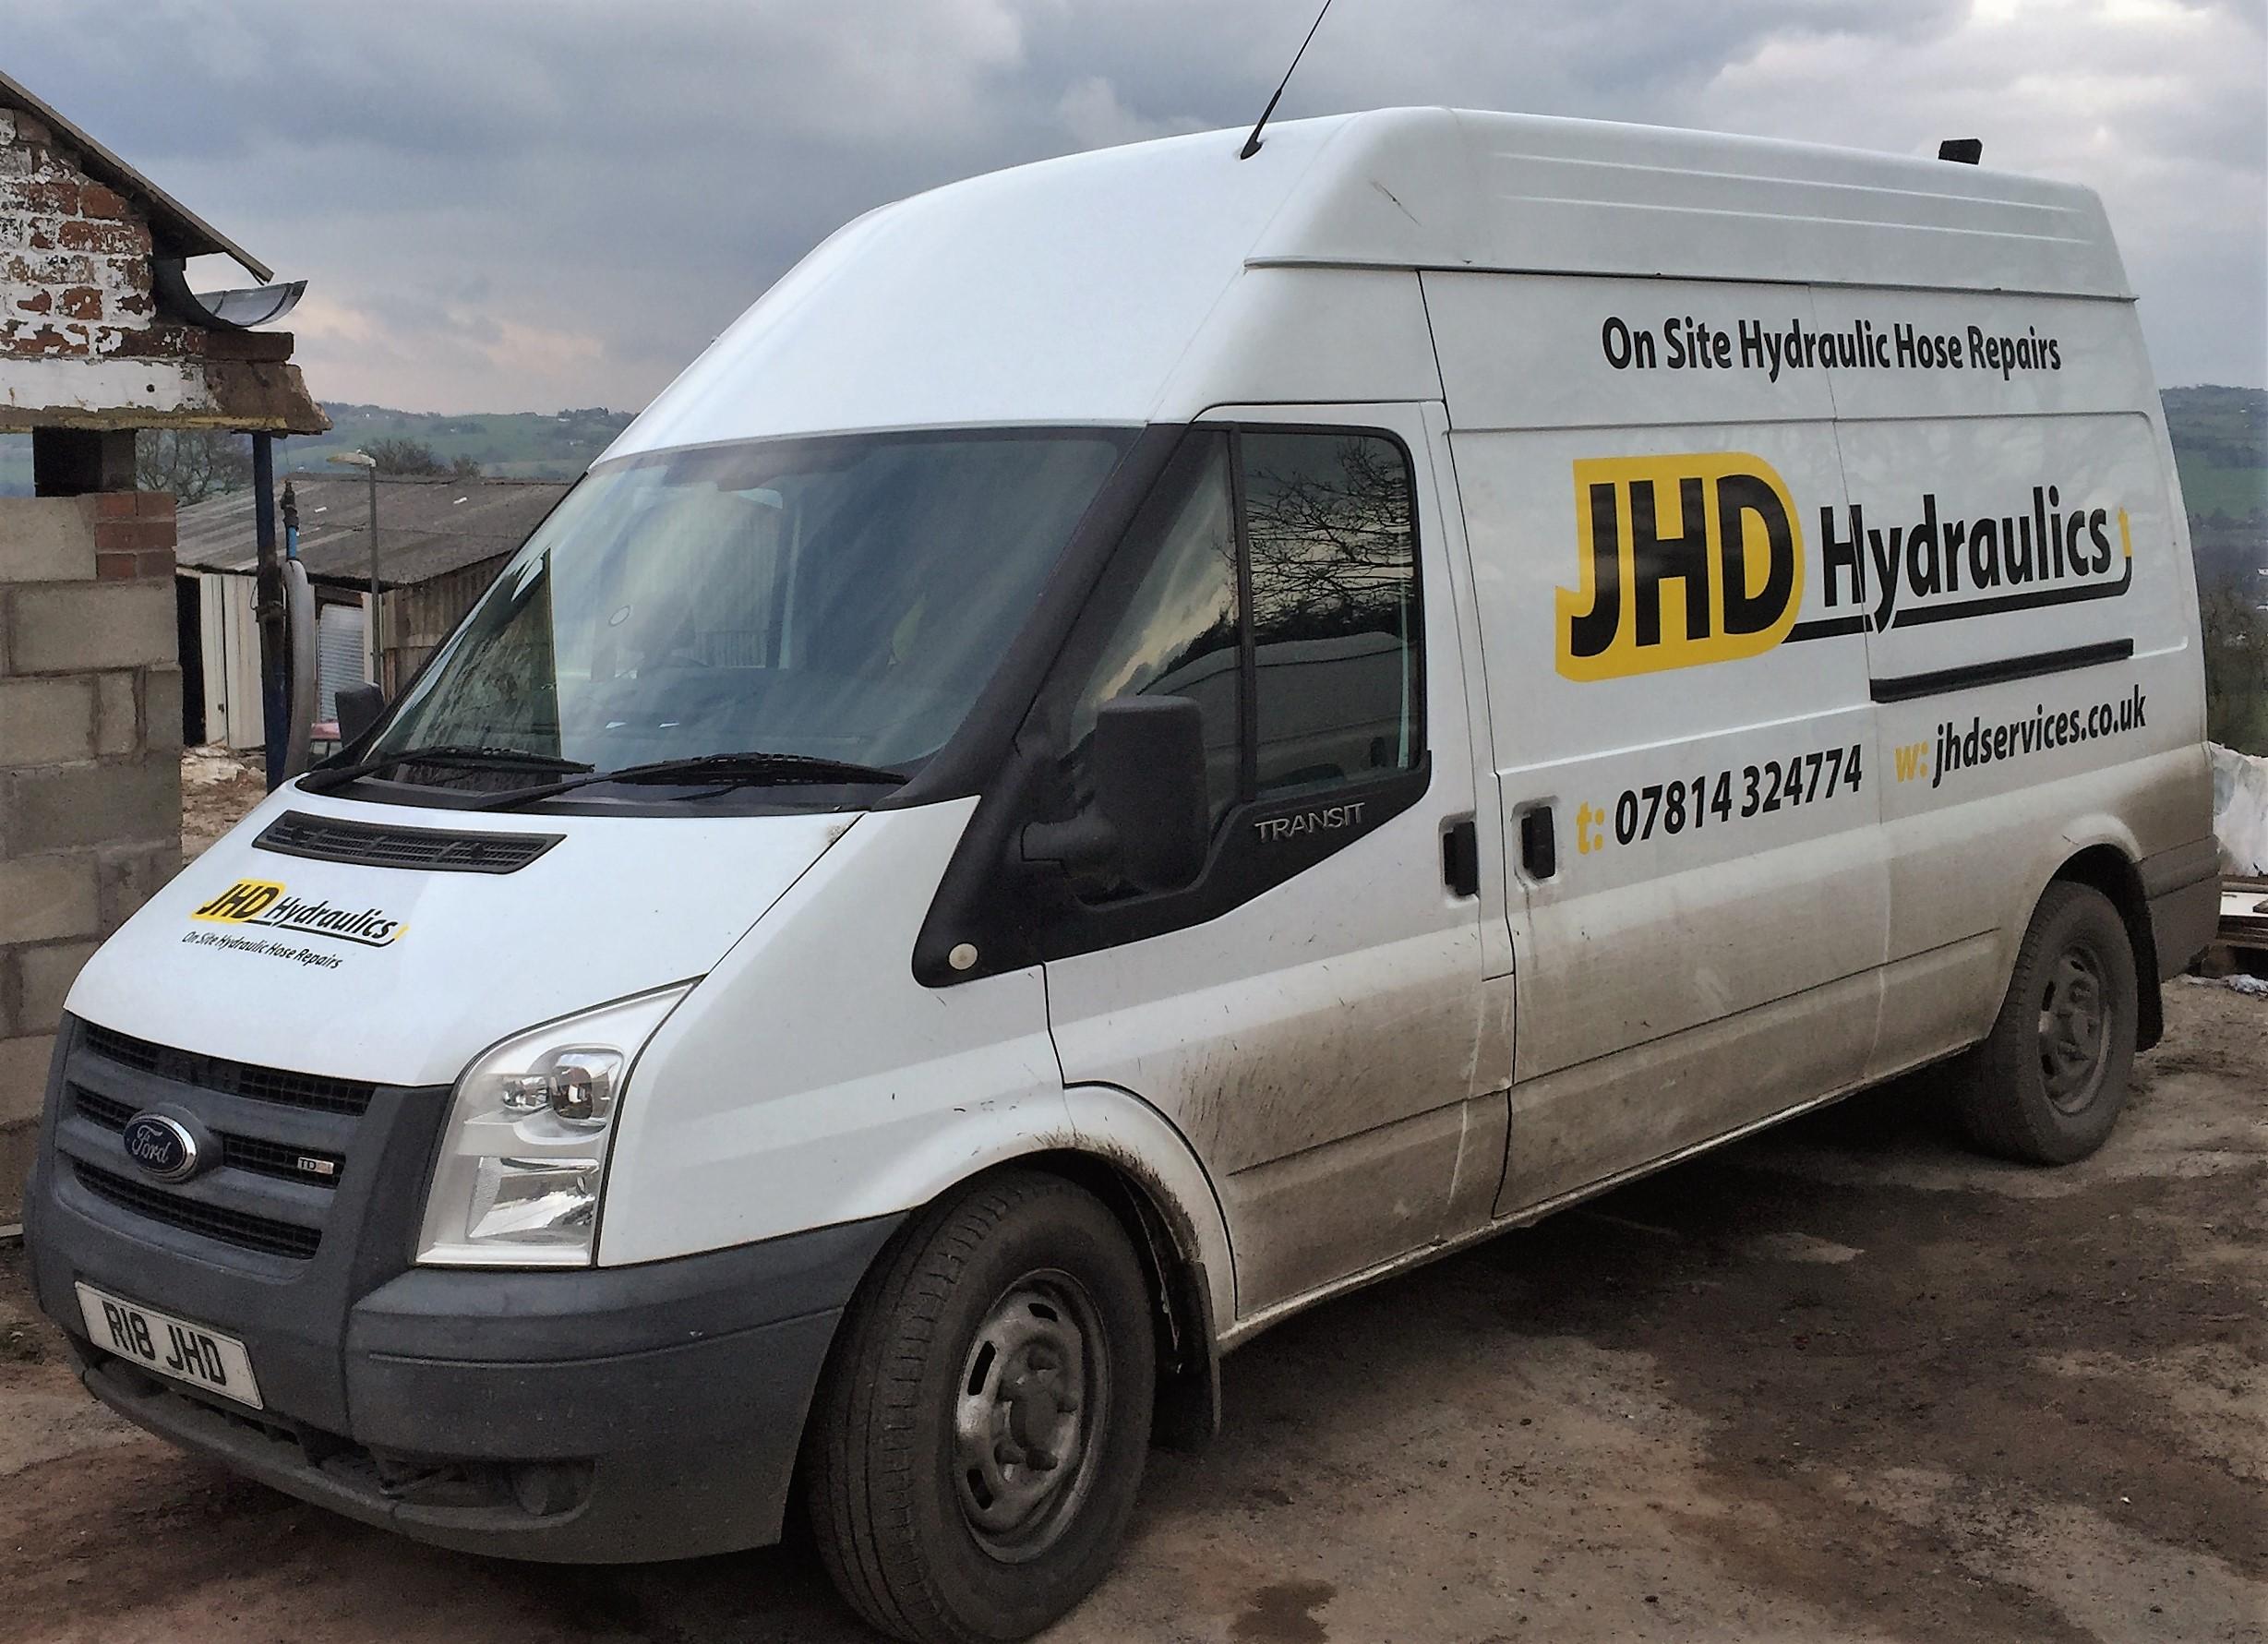 JHD Hydraulics - Knypersley, Staffordshire ST8 6PY - 07814 324774 | ShowMeLocal.com